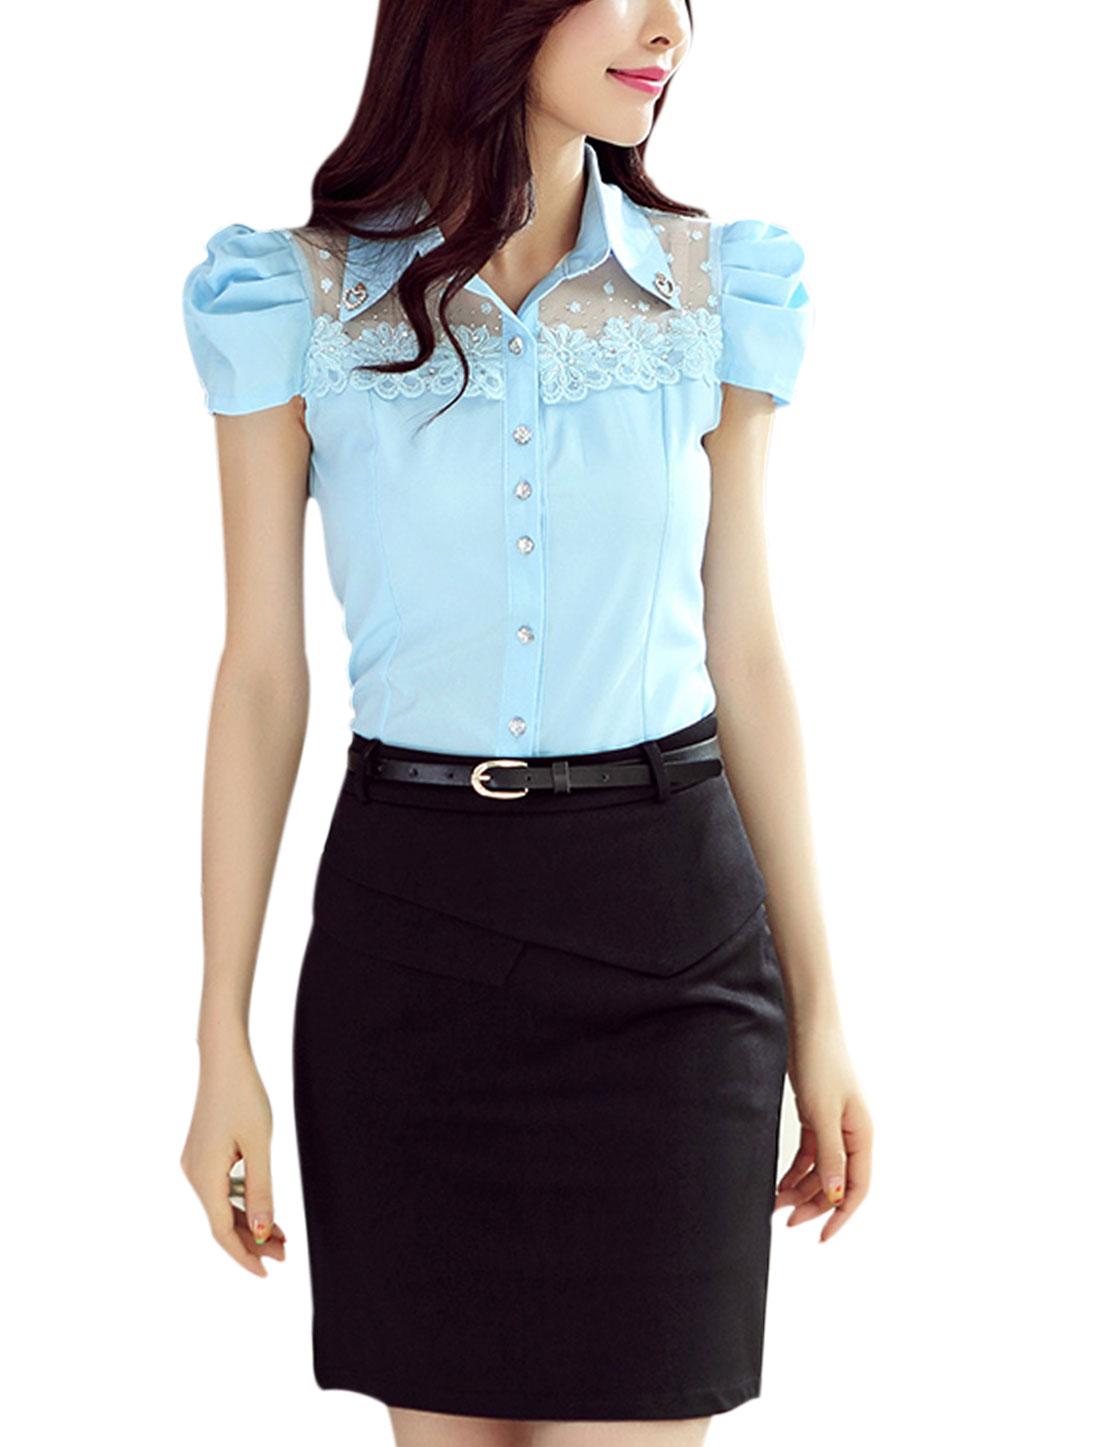 Women Rhinestones Embellished Lace Panel Short Puff Sleeves Shirt Light Blue L